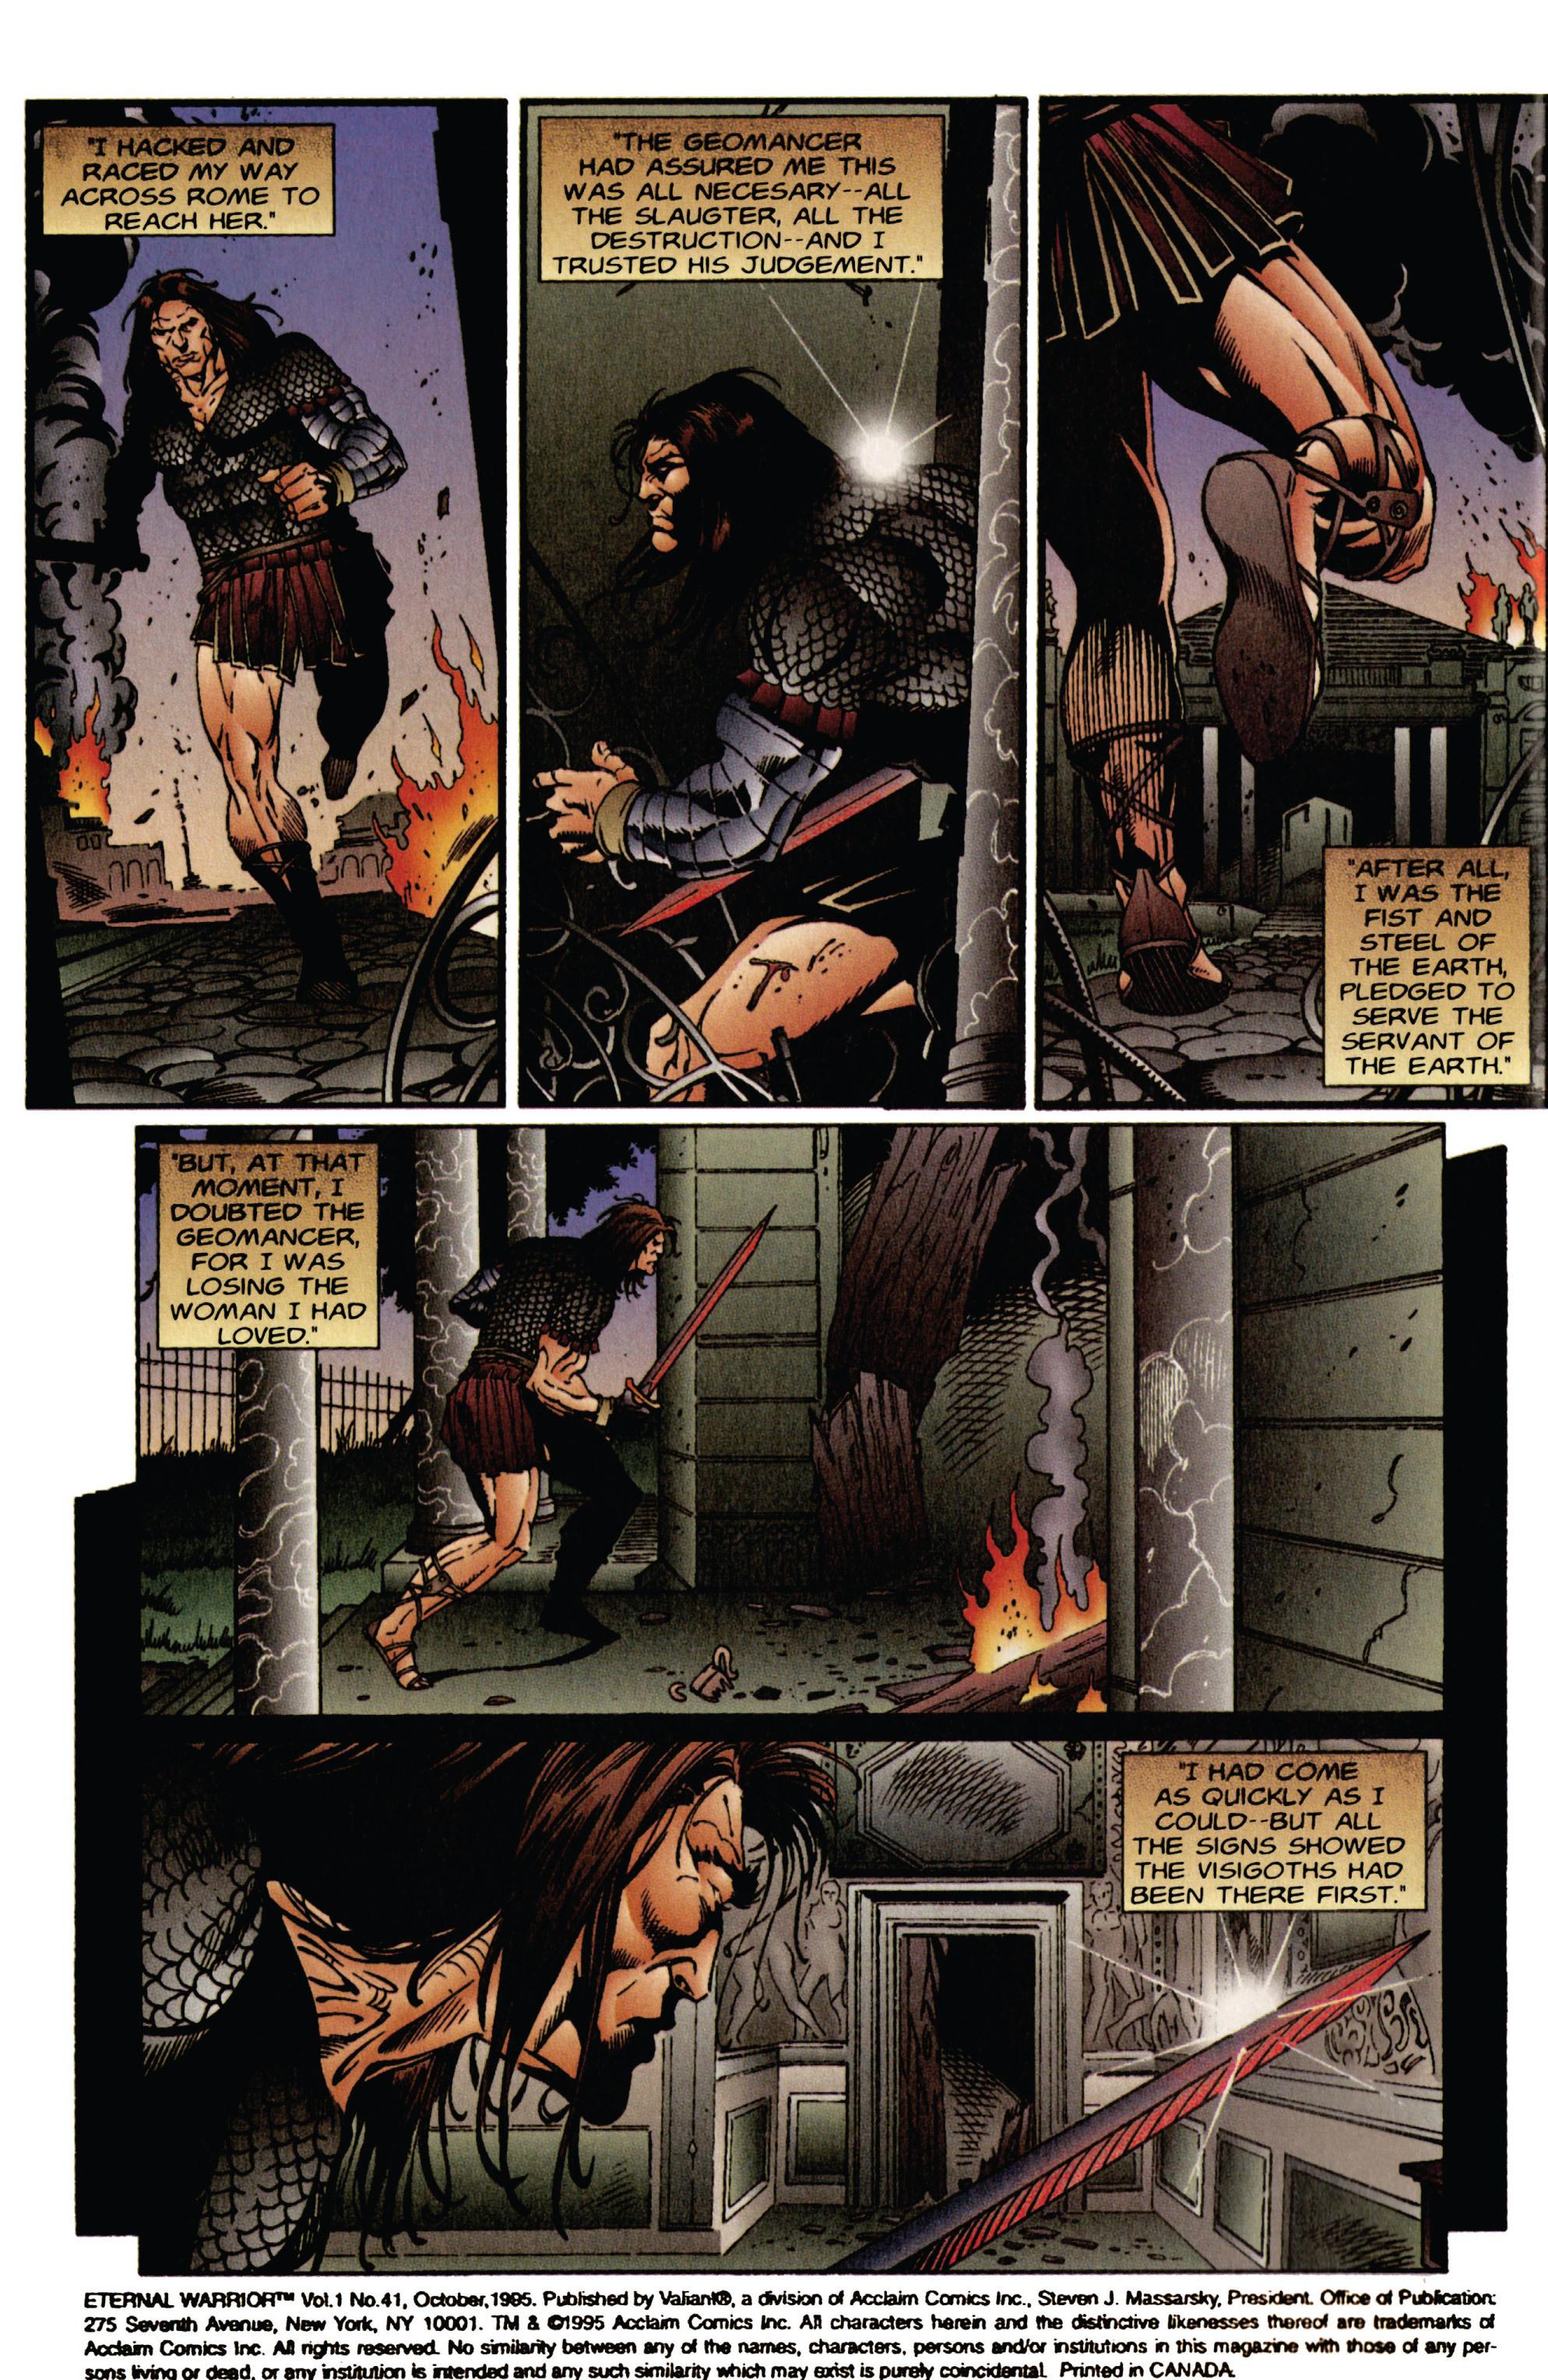 Read online Eternal Warrior (1992) comic -  Issue #41 - 3